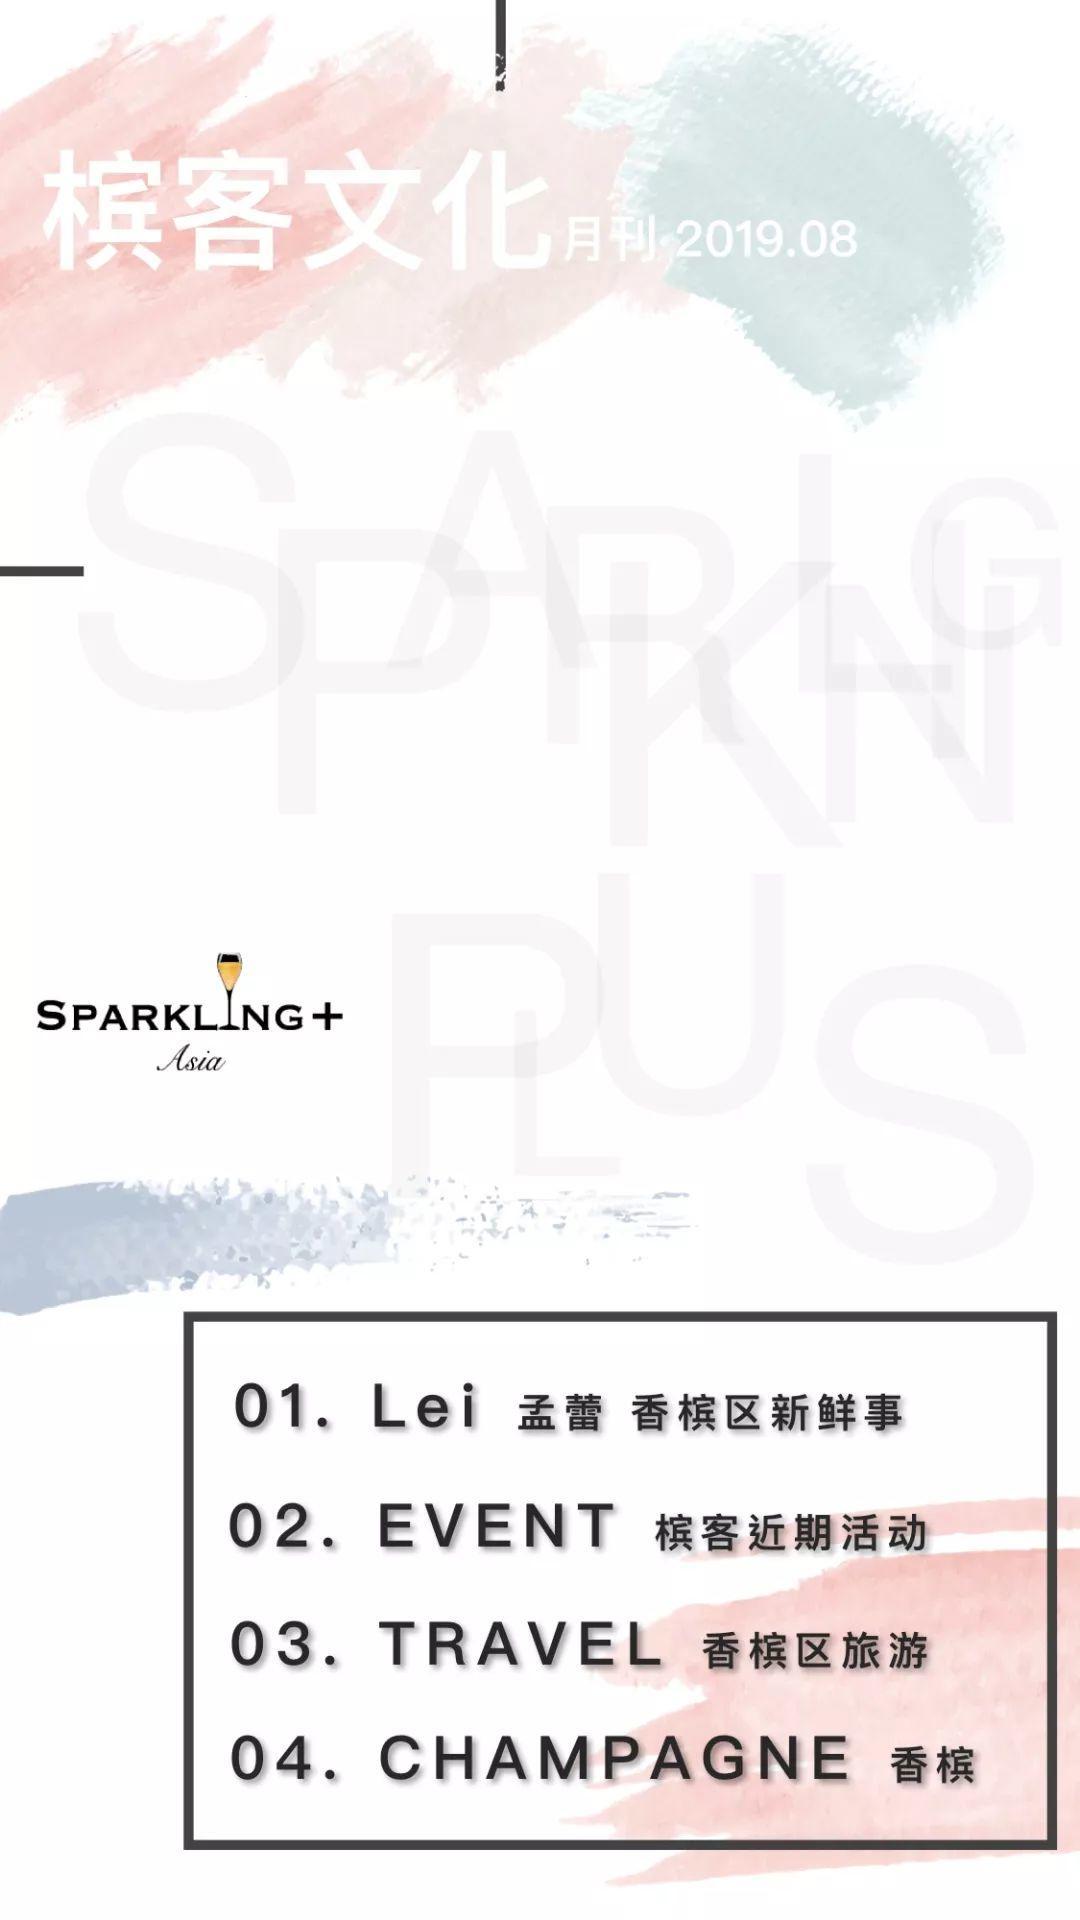 槟客月刊 2019.08   夏末の香槟新鲜事